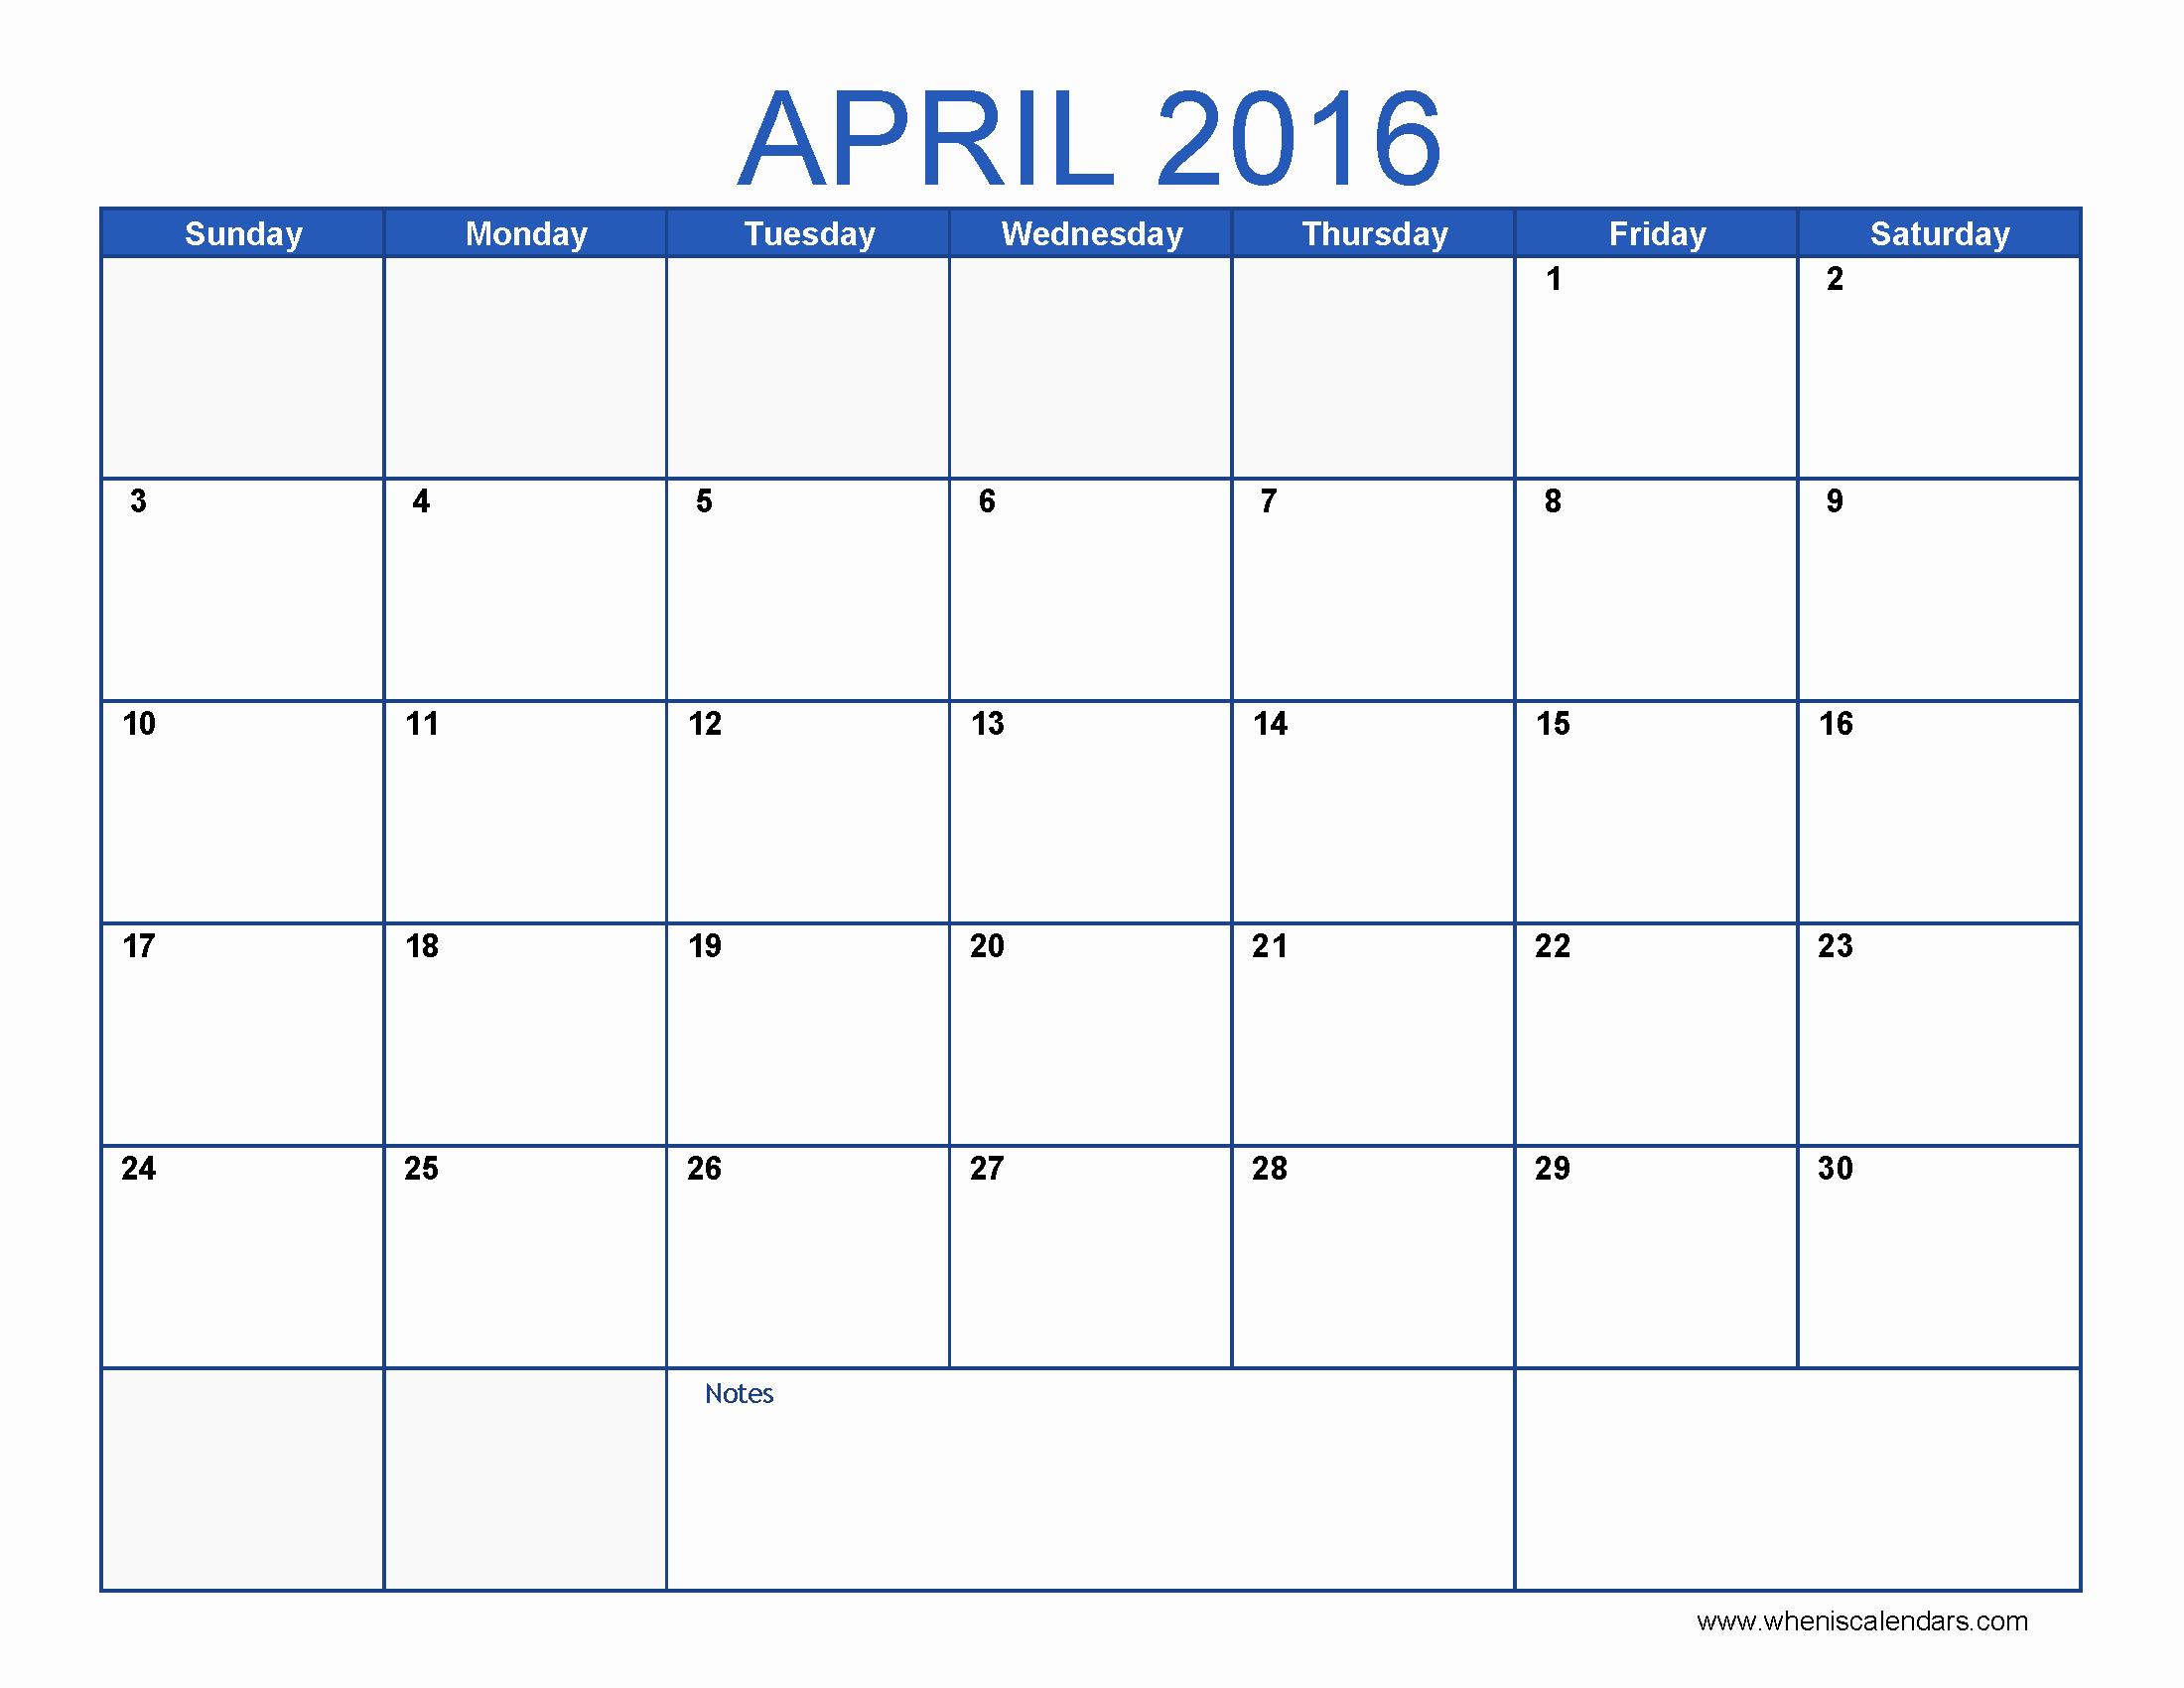 Blank Monthly Calendar Template Word New Blank Monthly Calendar Template Word Mughals